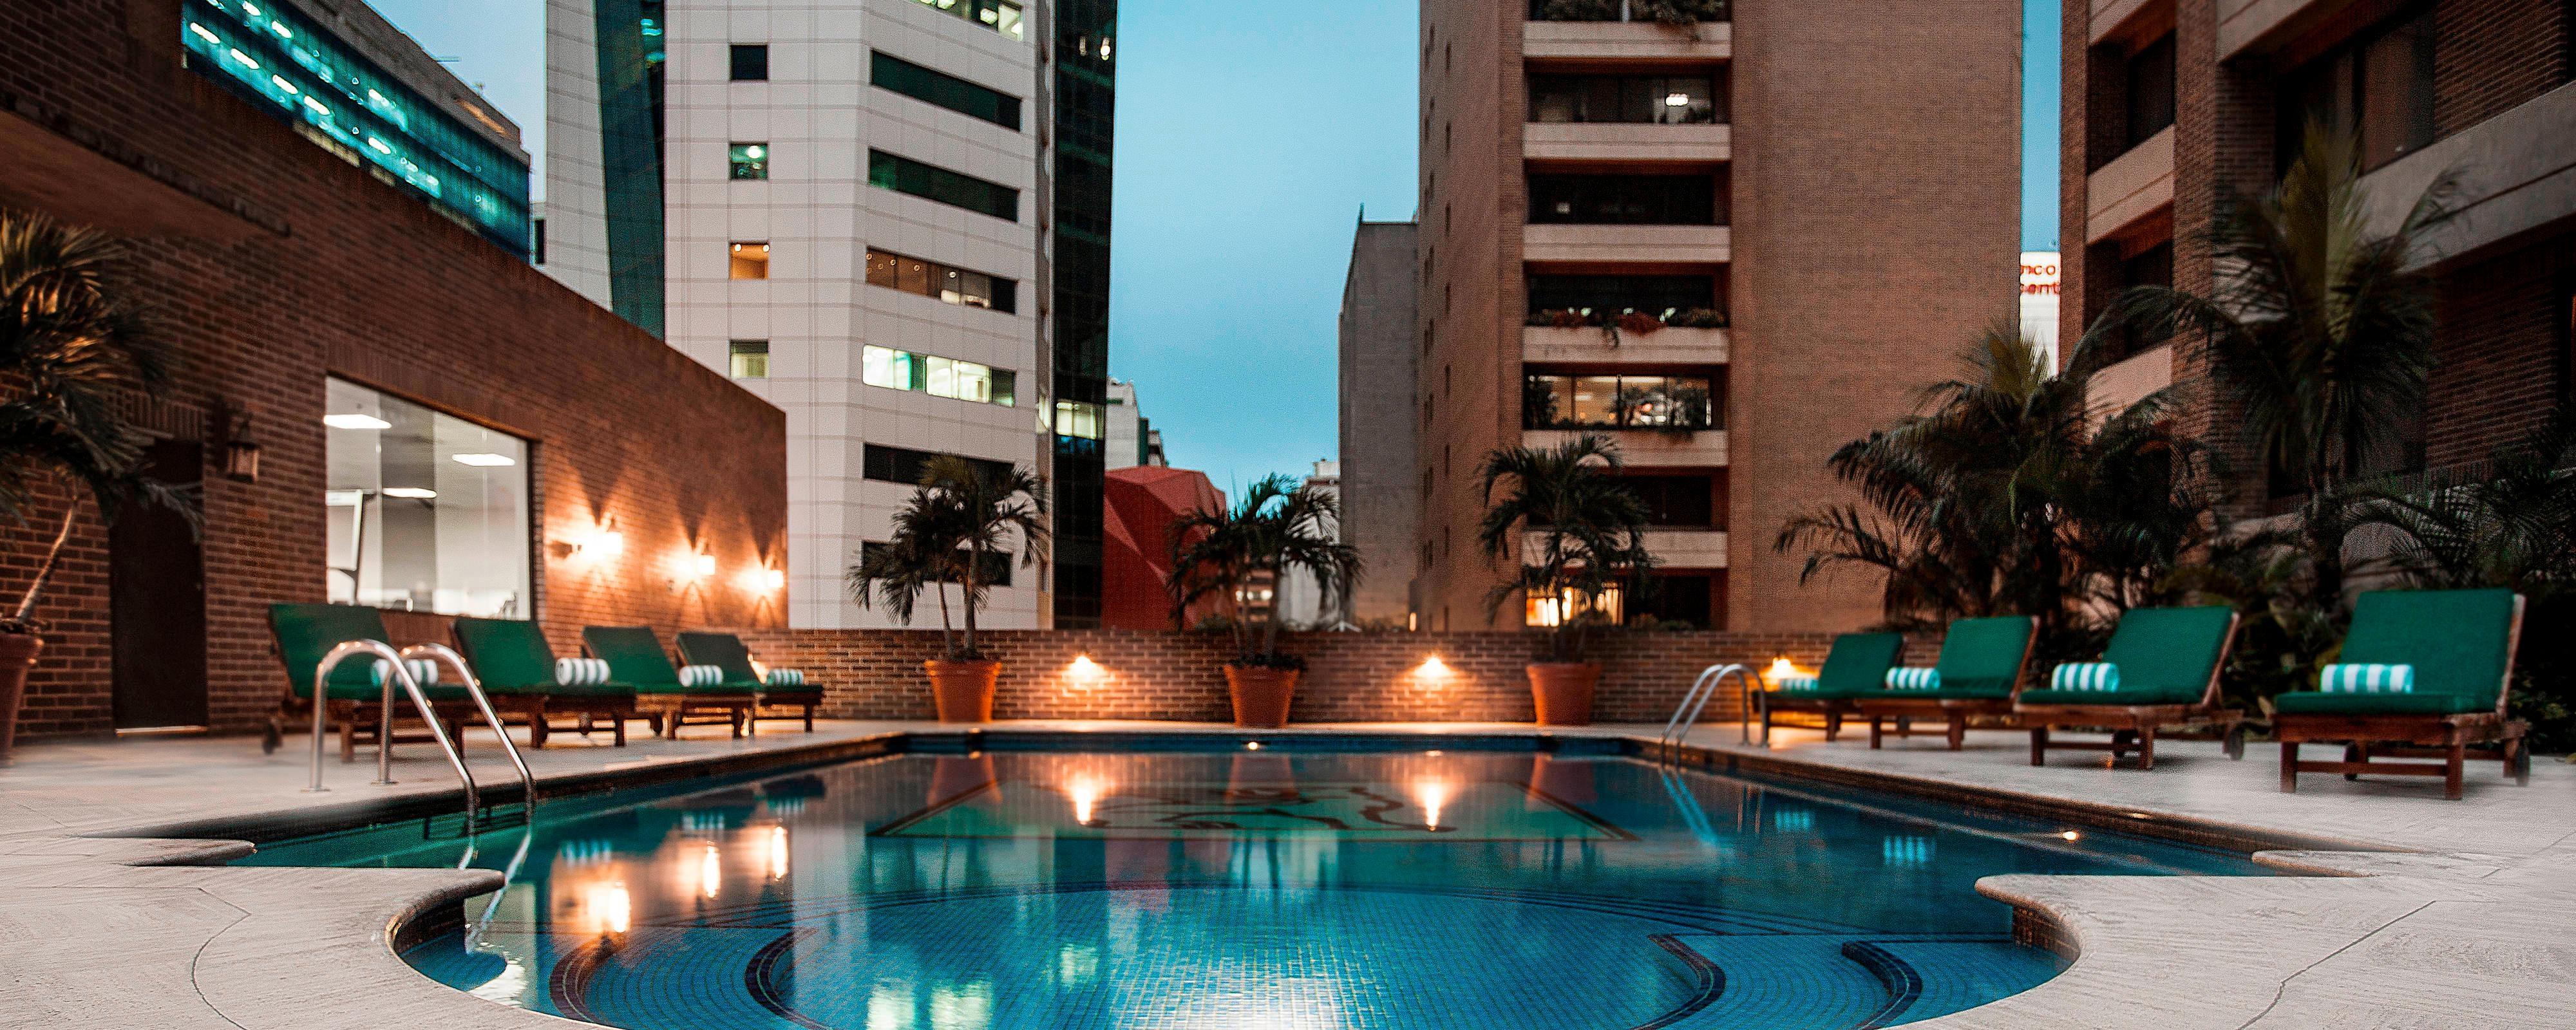 Caracas Hotel Pool